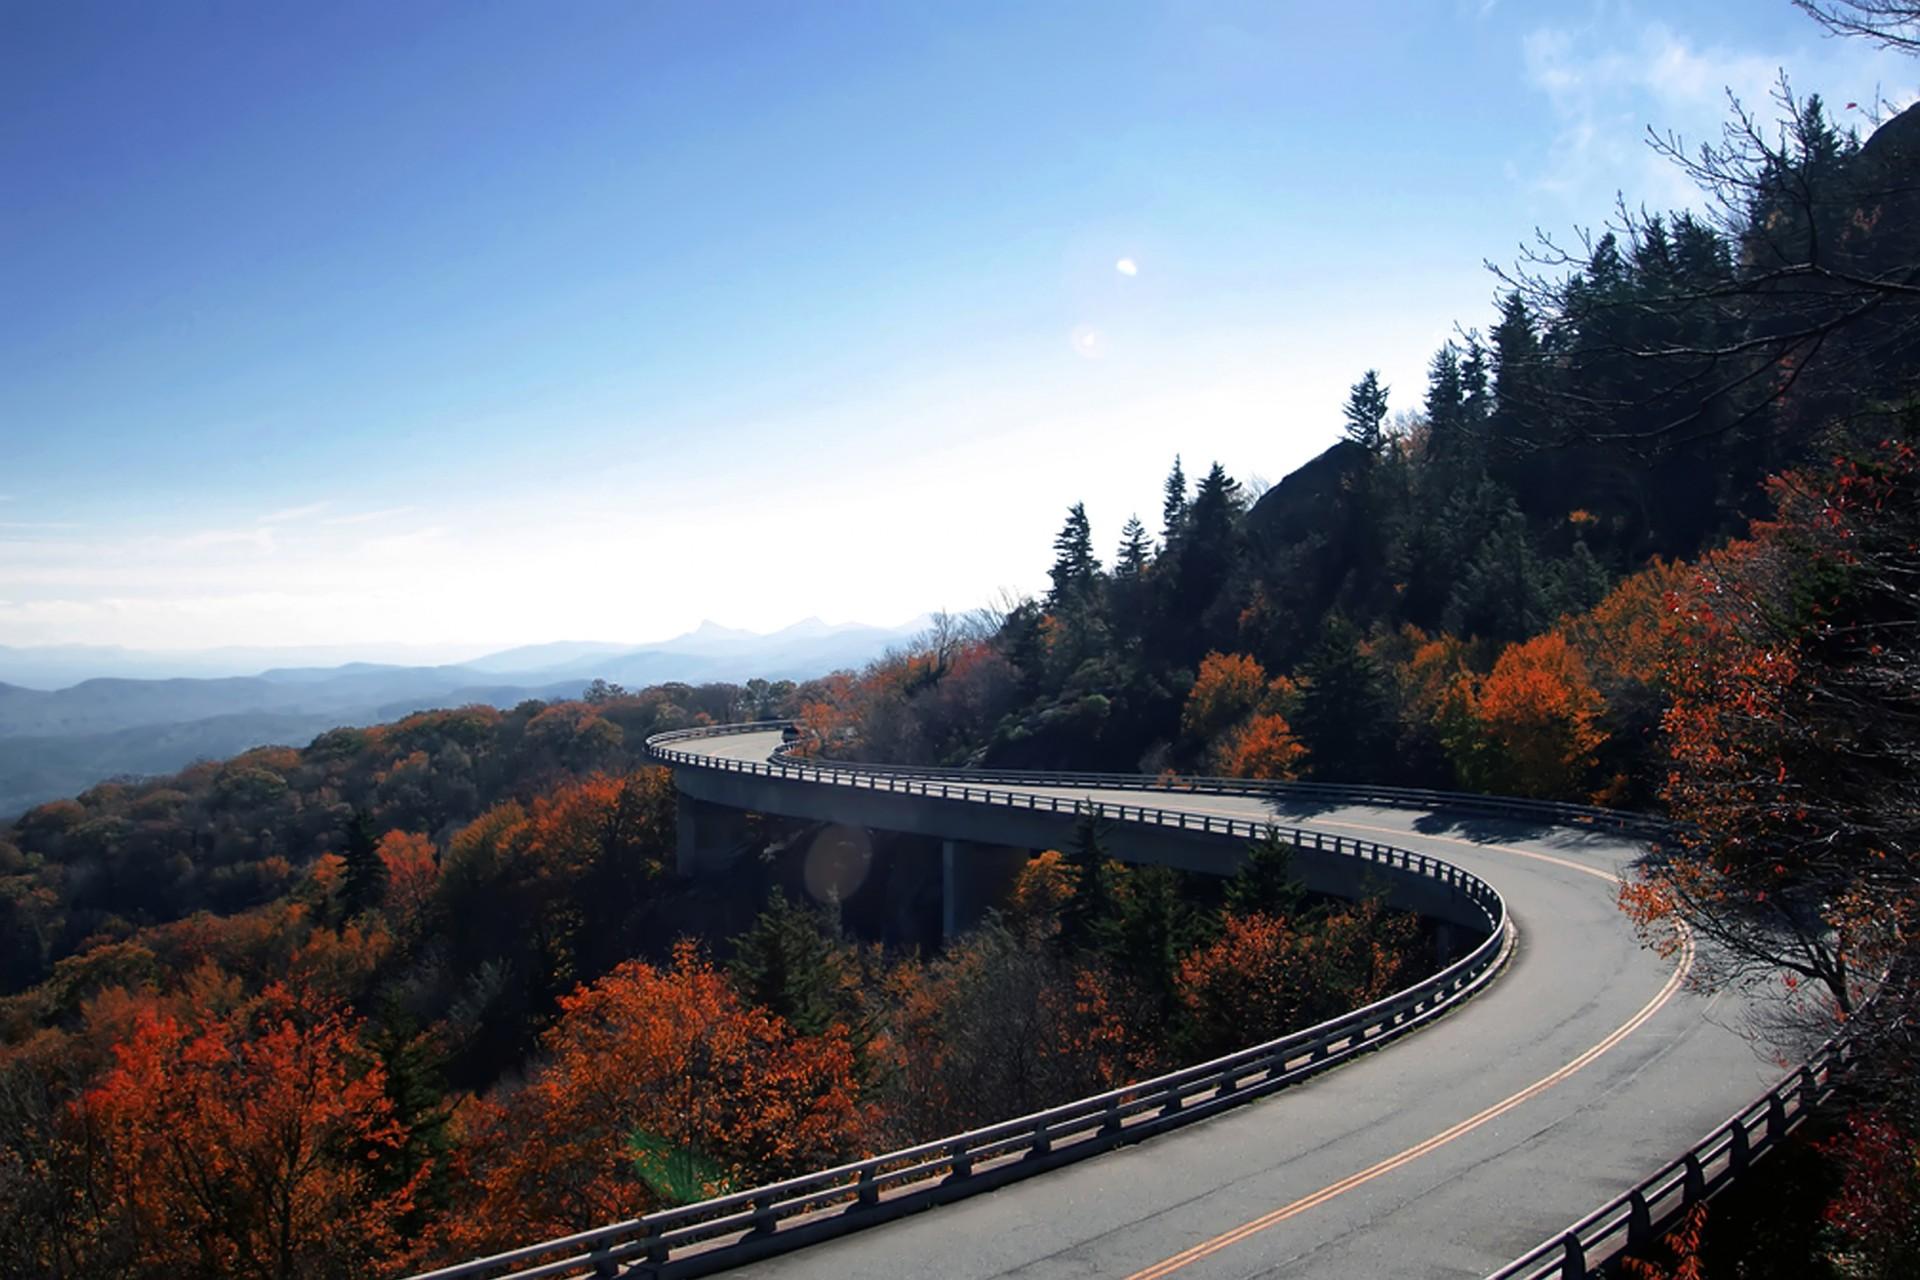 The Linn Cove Viaduct in fall